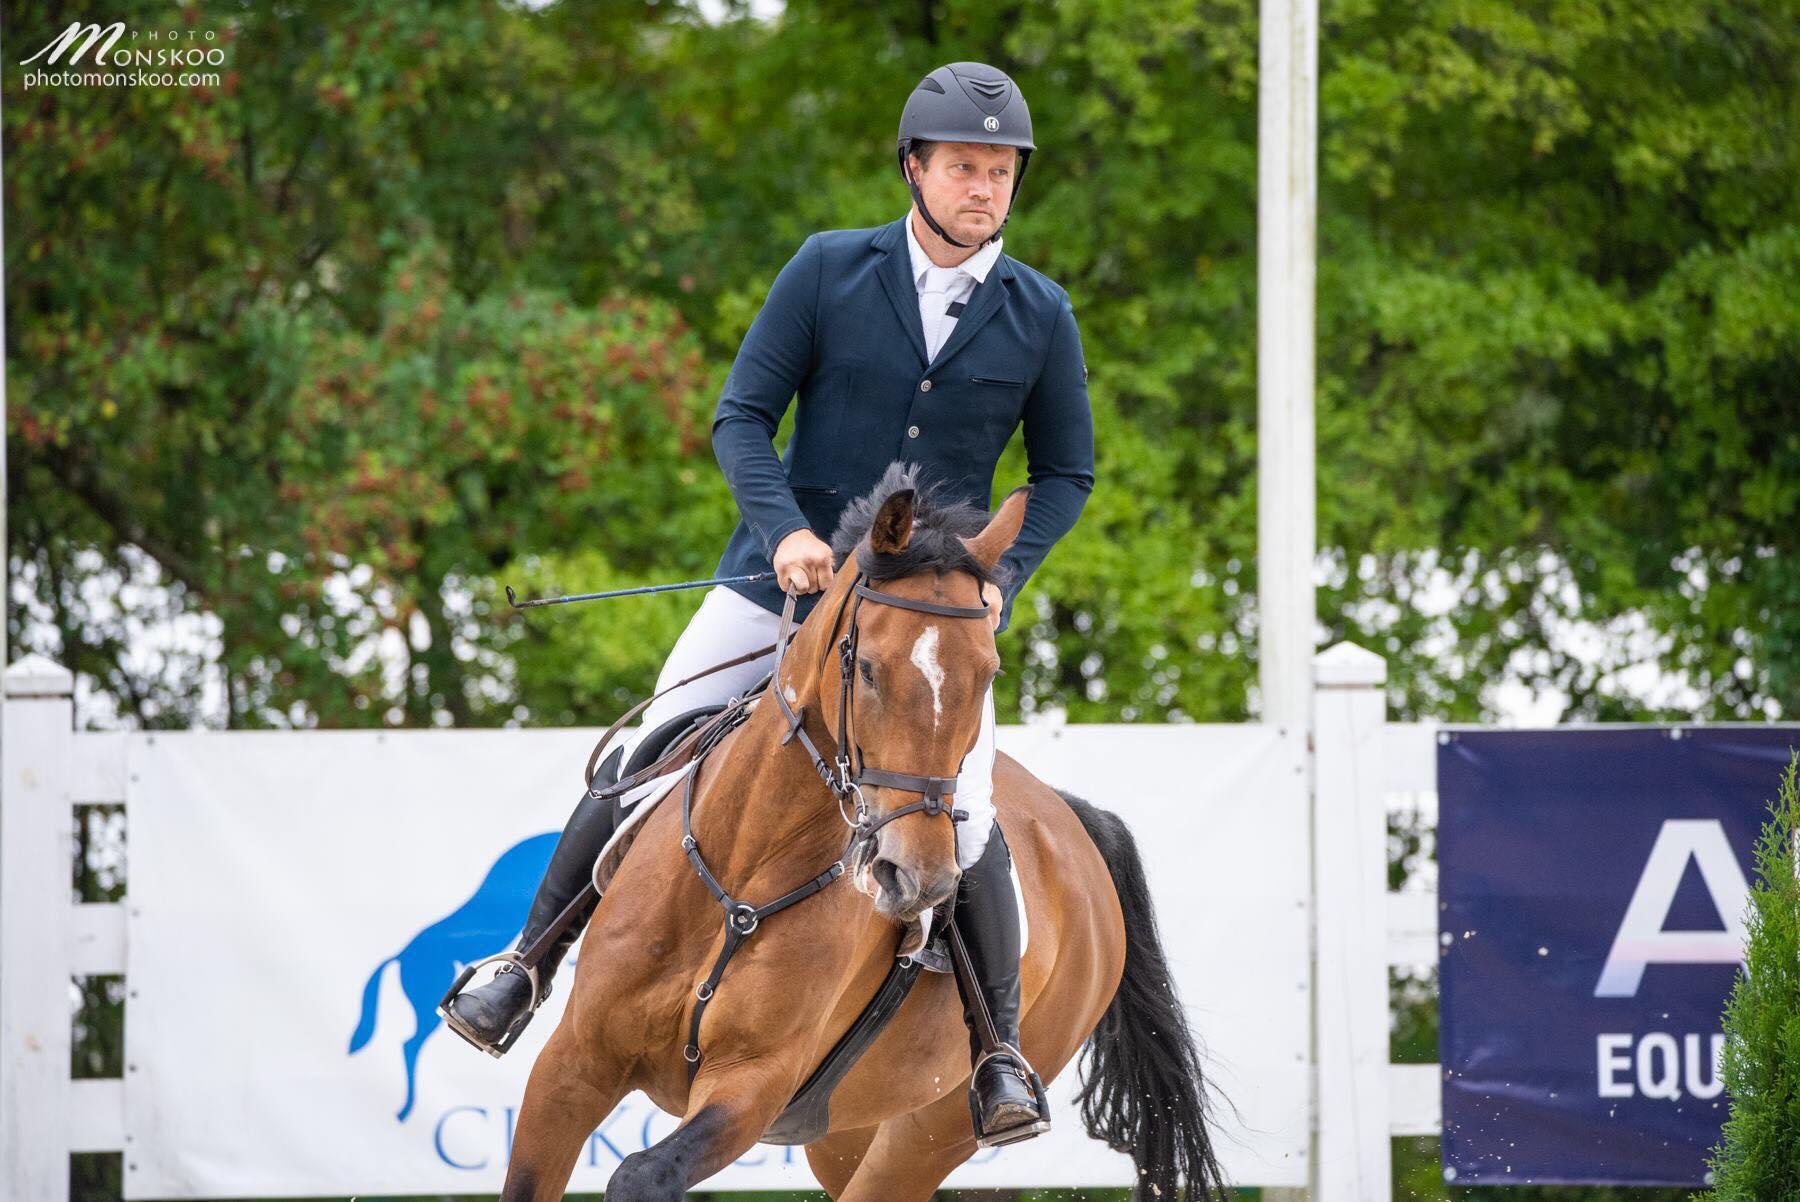 Gyldermyra_Rideskole_SR_Stables_Sprang_Hest_Riding_Hopp